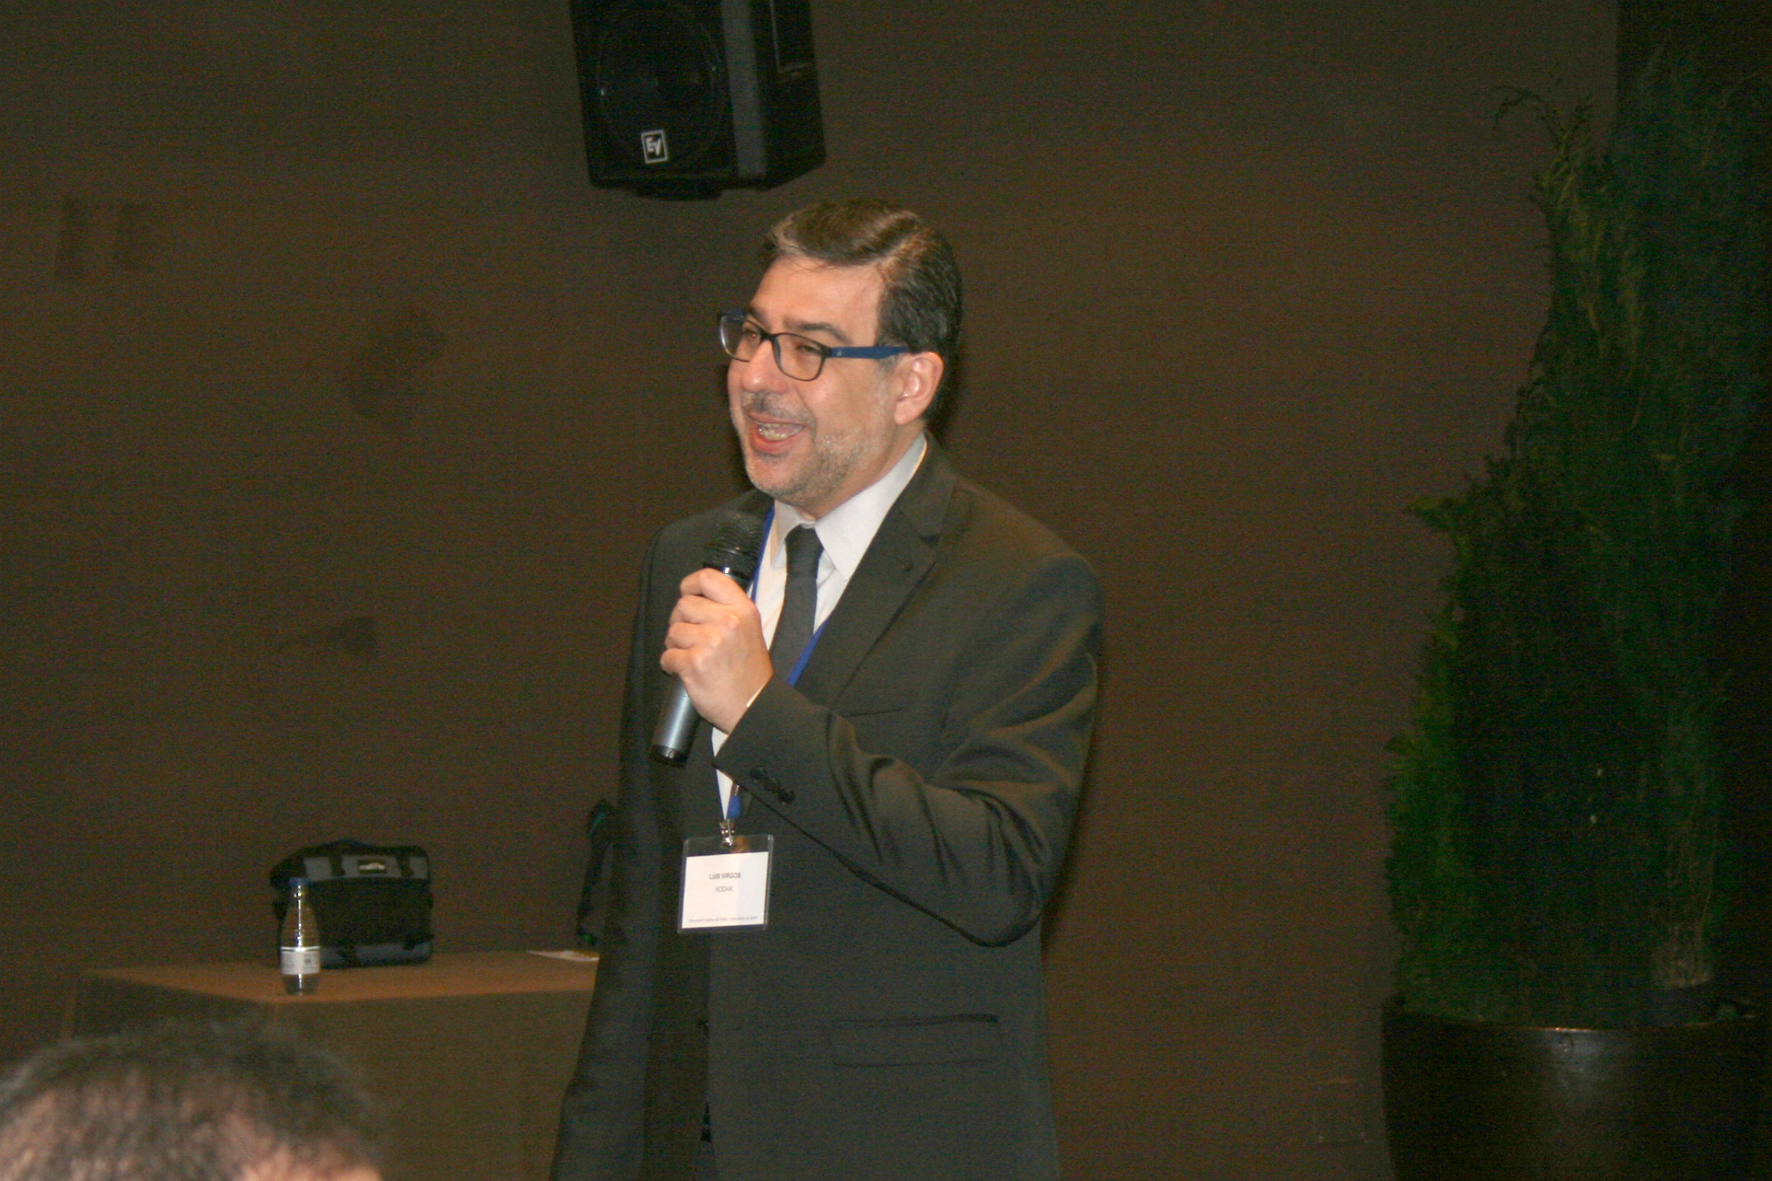 Luis Virgos